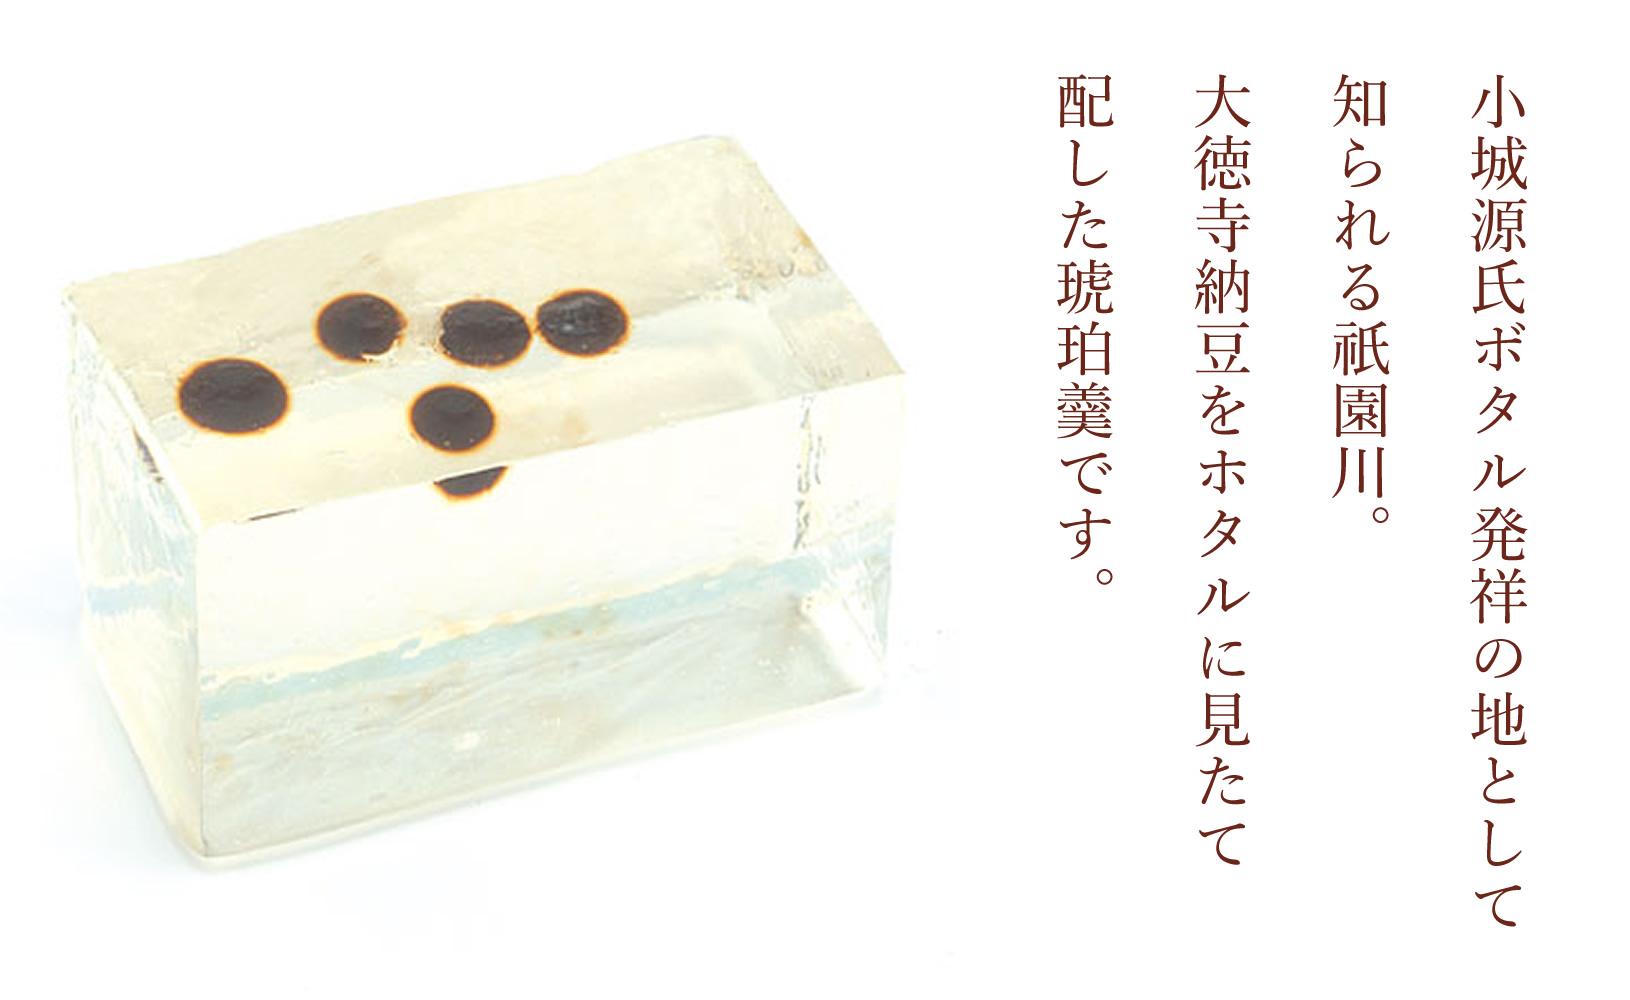 【六月】祇園川